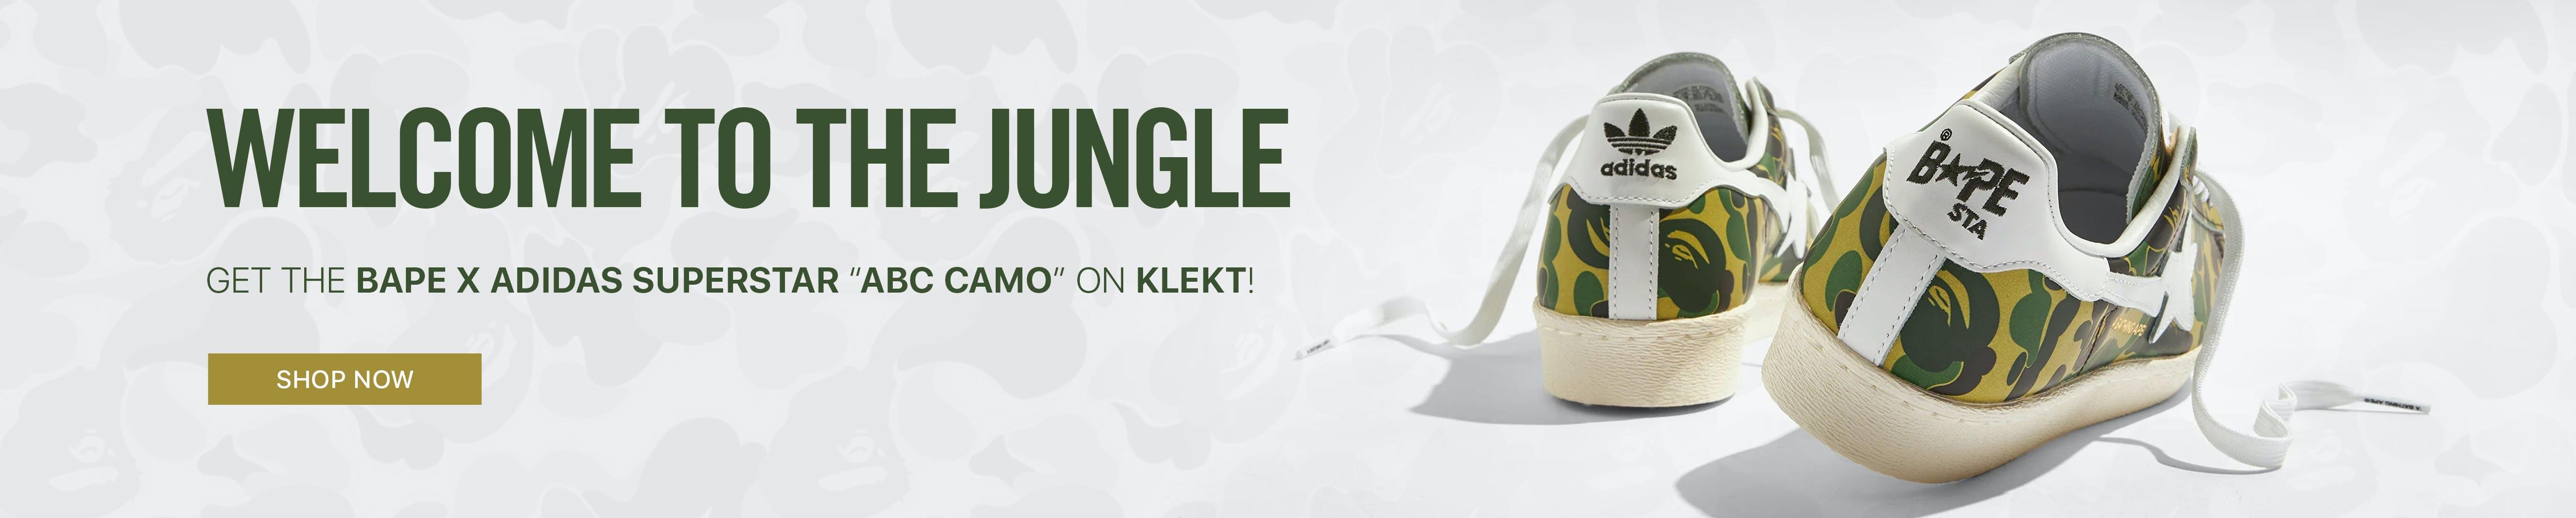 adidas x bathing ape-superstar 80s 2021 KLEKT KLEKTIVE